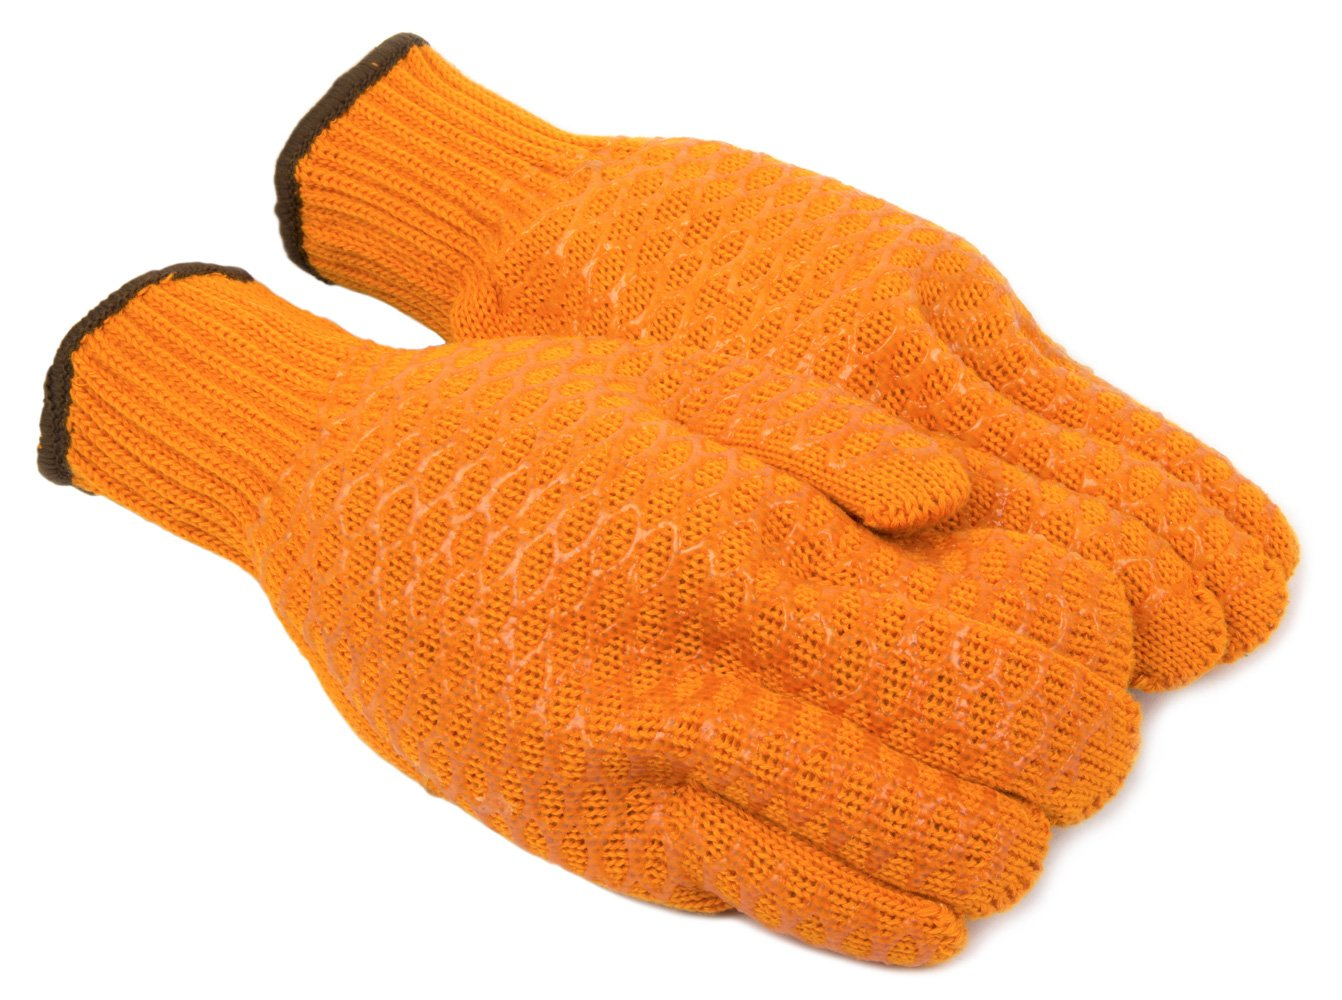 Orange Large Forney 53285 String Knit Honeycomb PVC Grip Mens Gloves